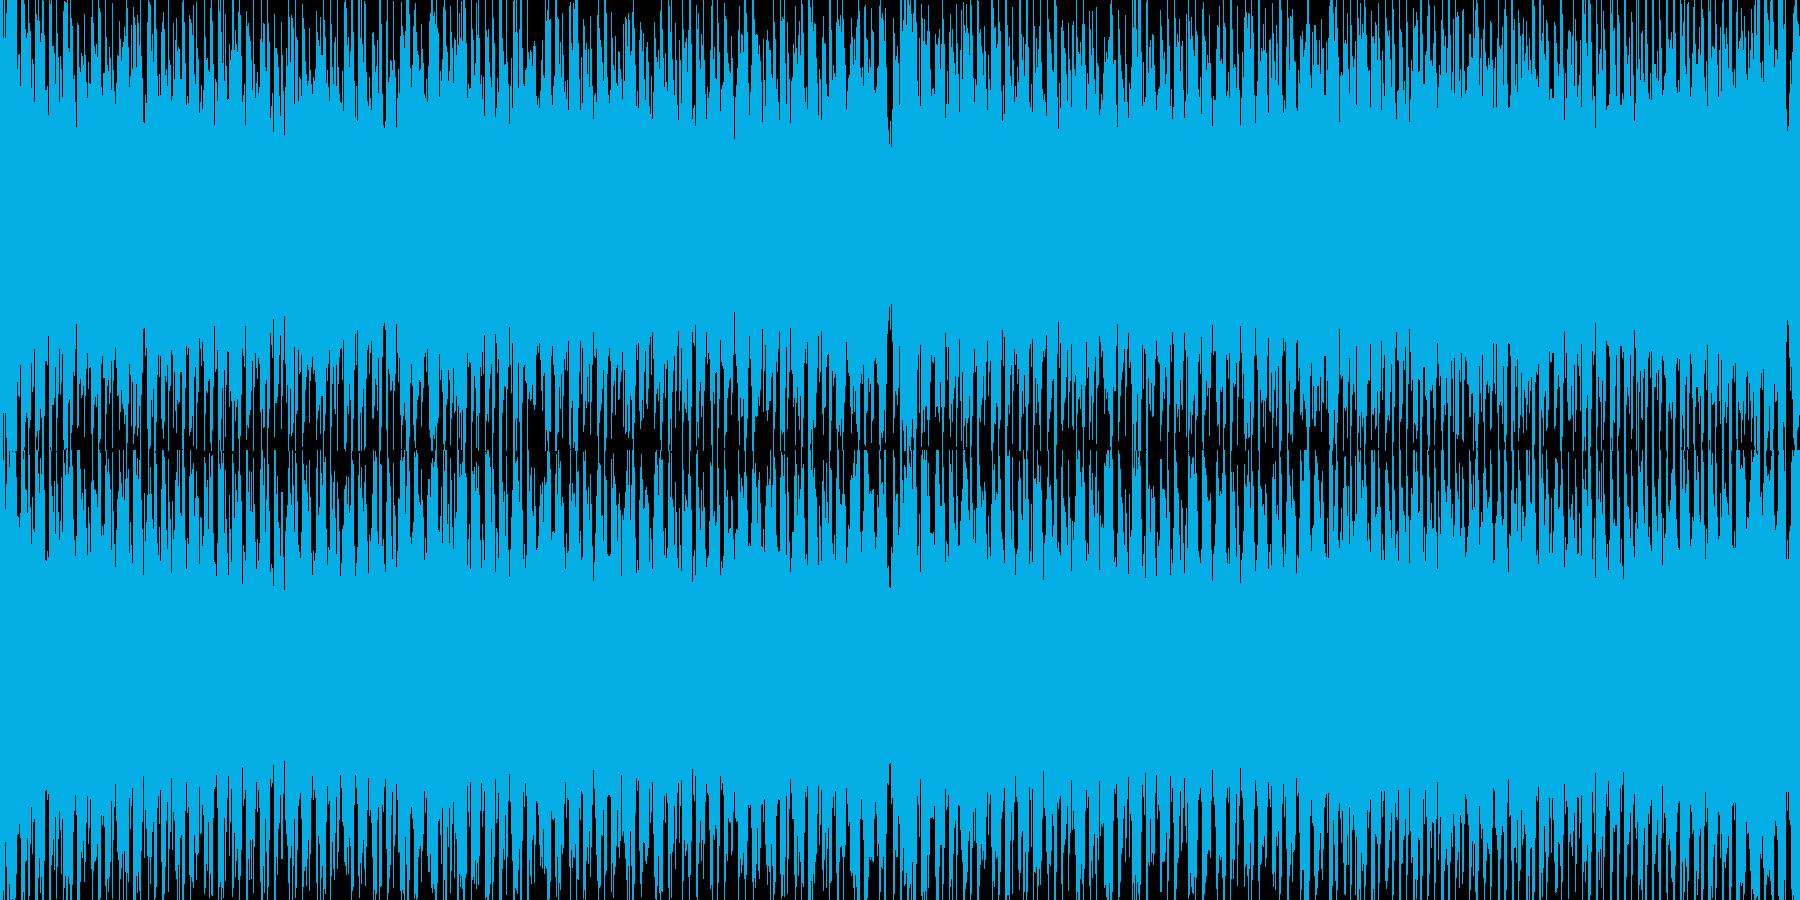 【EDMループ素材】企業・映像制作向きCの再生済みの波形